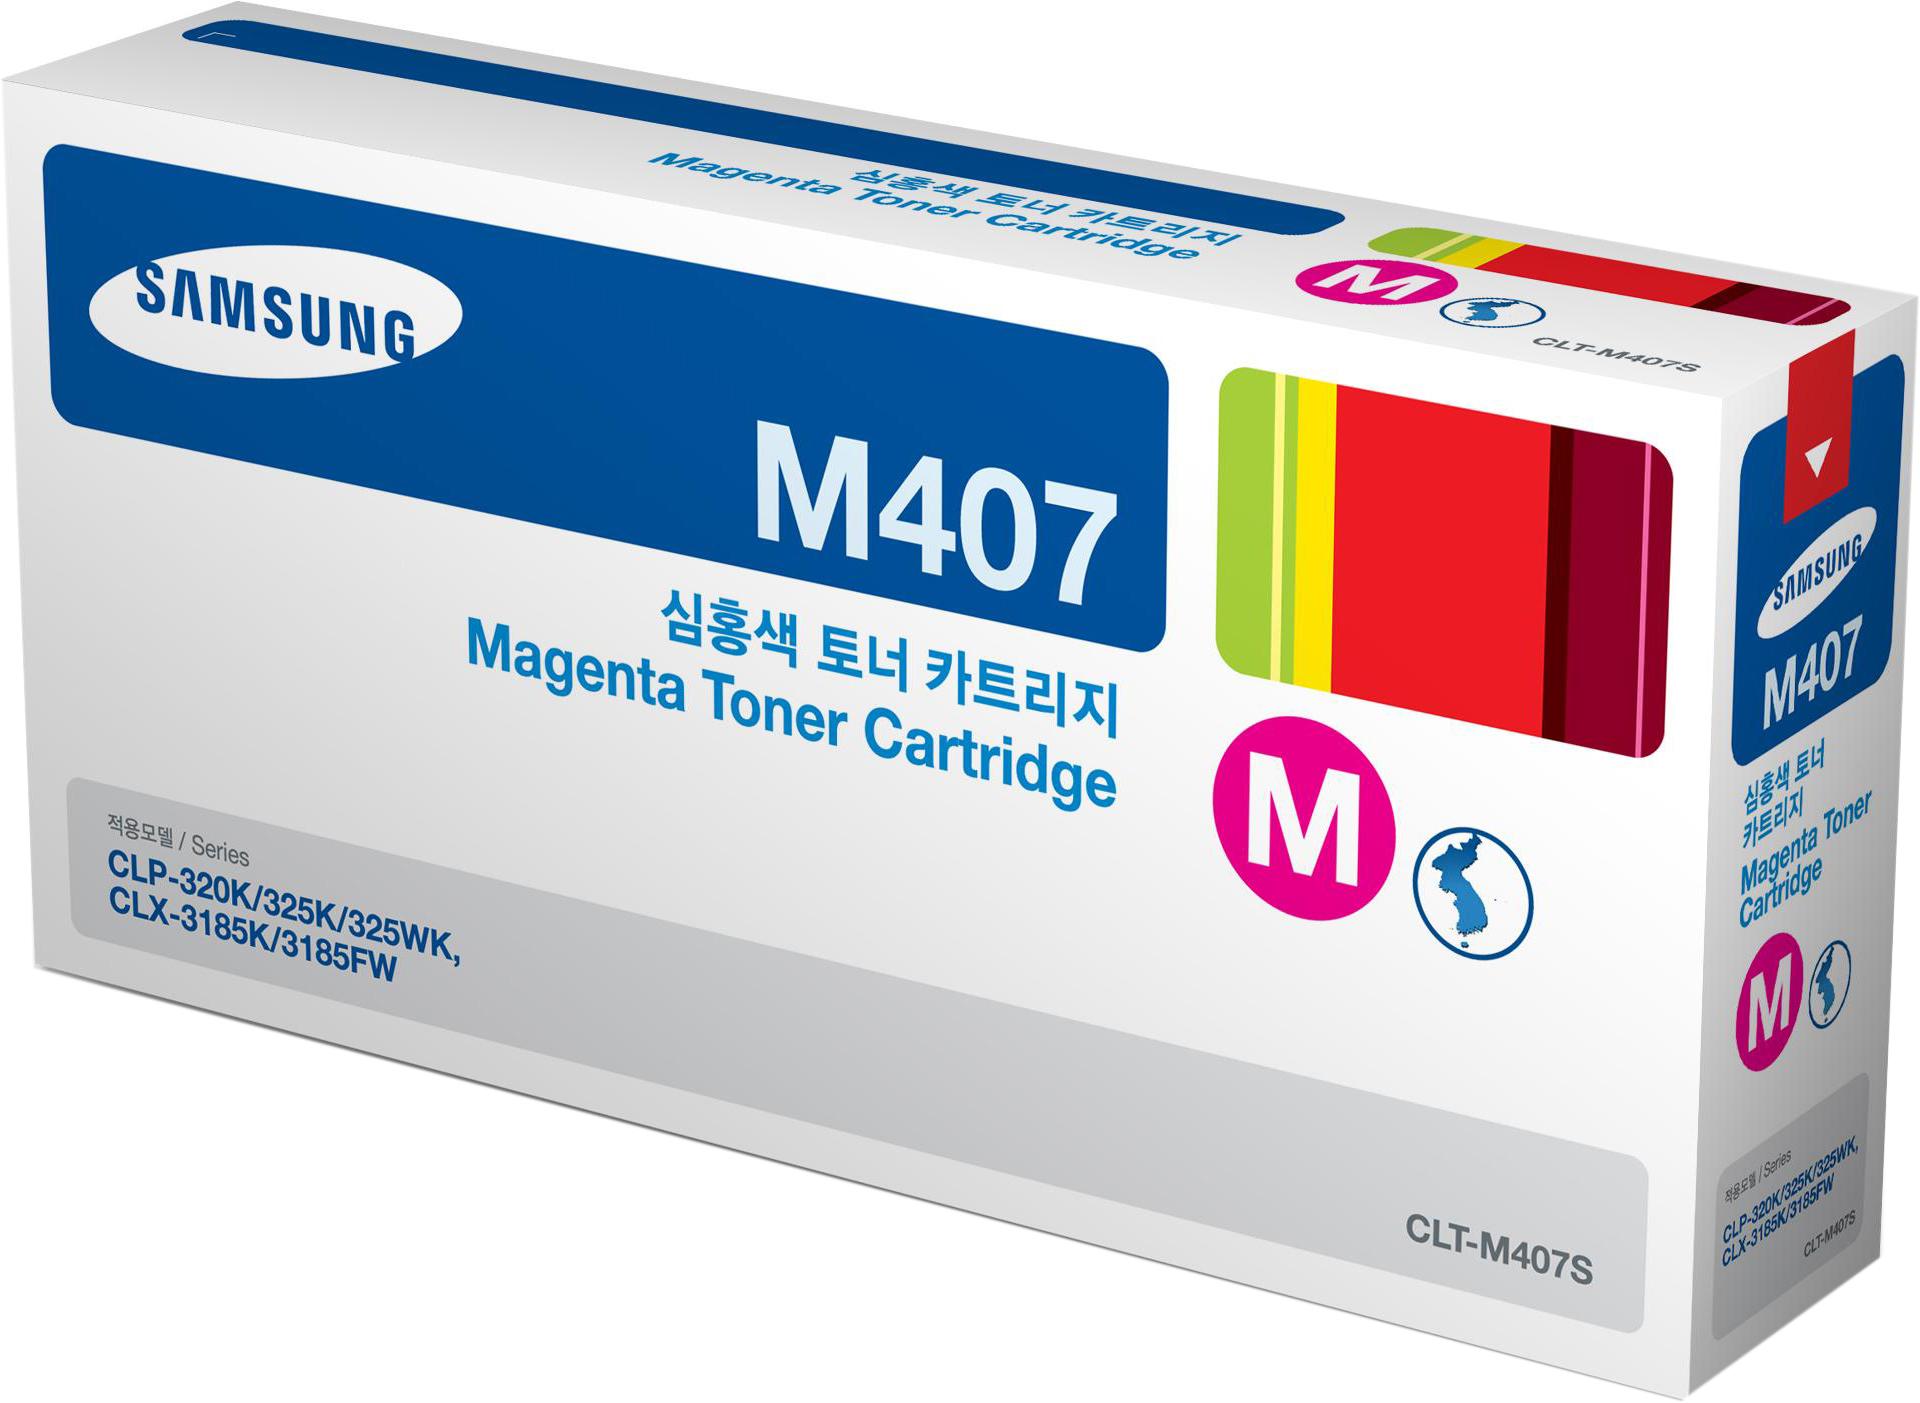 Картридж Samsung SU266A CLT-M407S для Samsung CLP-320/325/CLX-3185. Пурпурный. 1000 страниц картридж samsung clp500d5m для samsung clp500 500n пурпурный